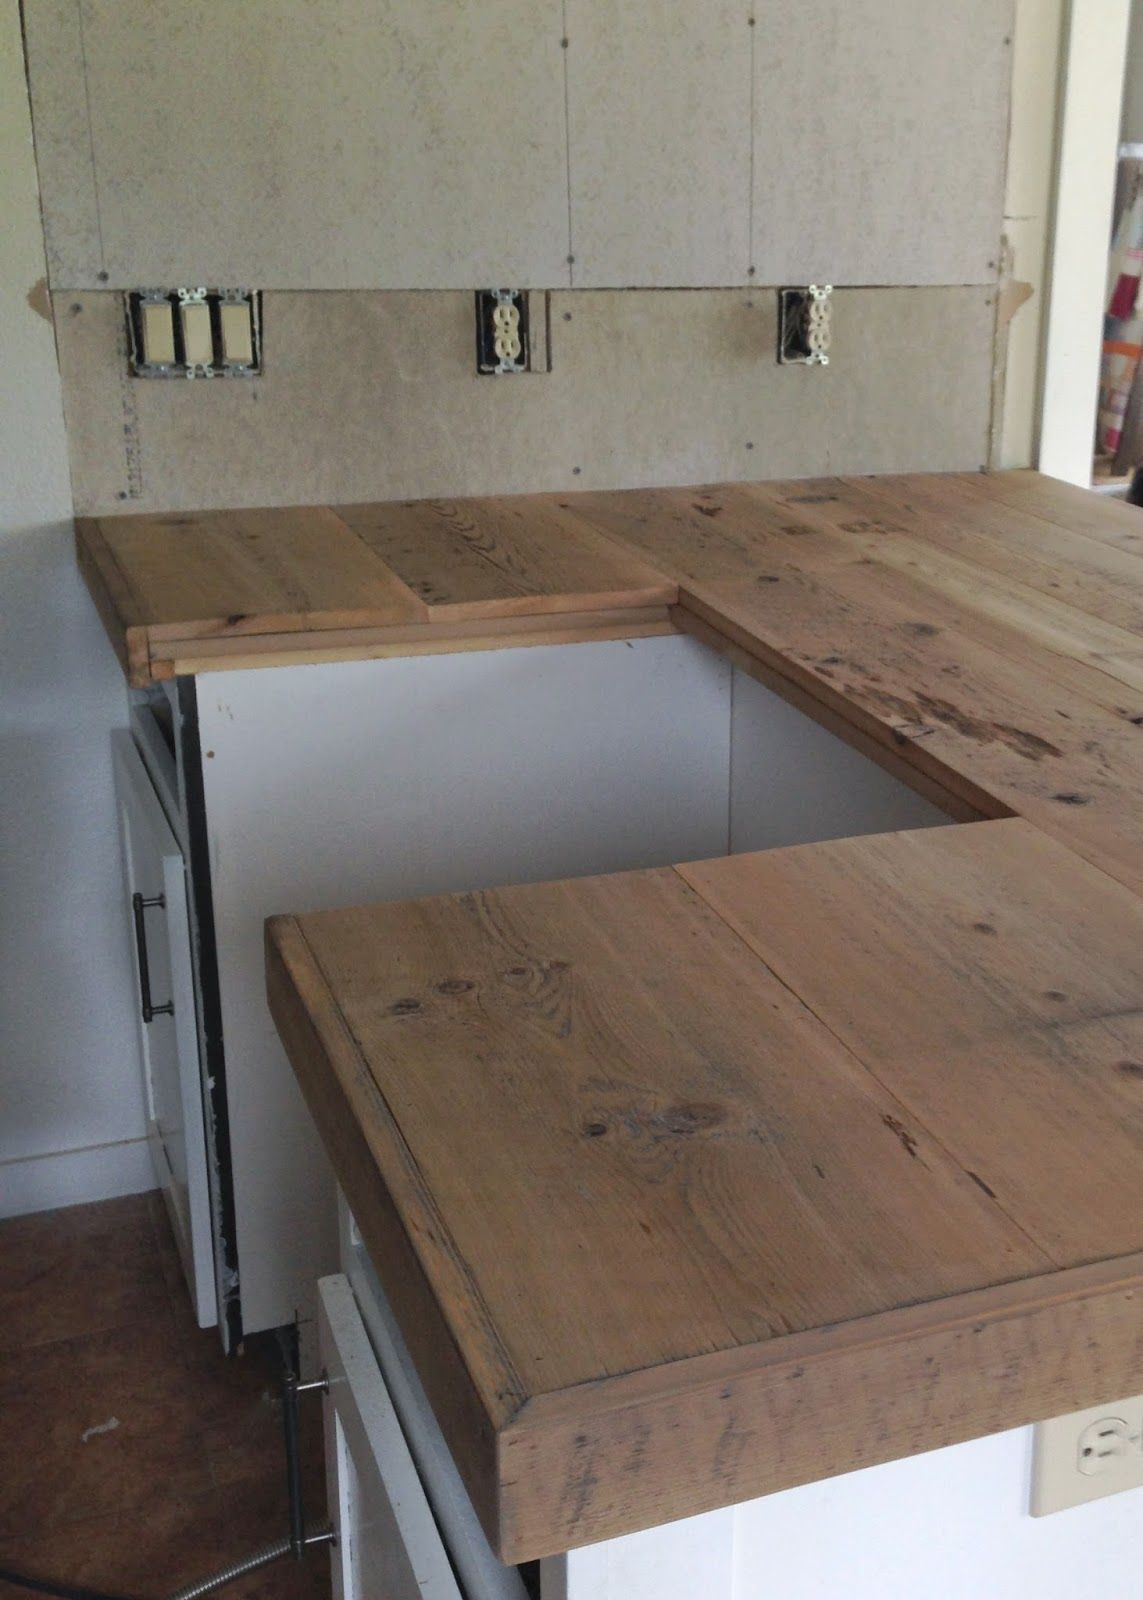 Diy Reclaimed Wood Countertop Reclaimed Wood Countertop Wood